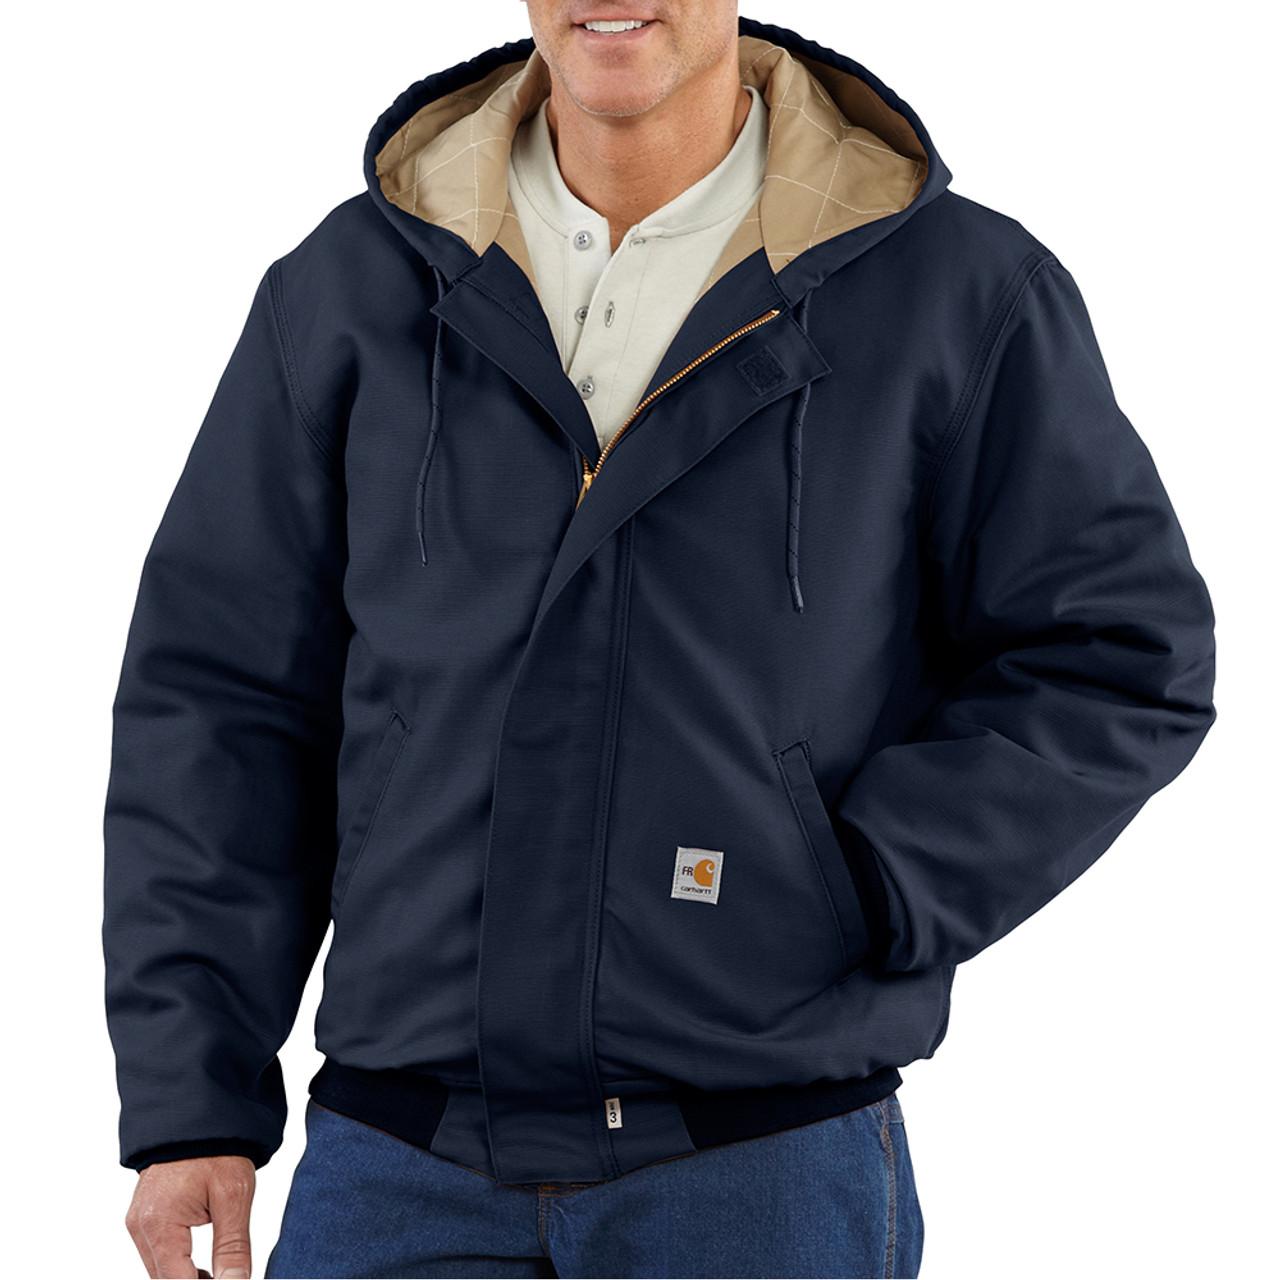 b10e8f1cad 101622 Men's Flame Resistant Canvas Active Jacket